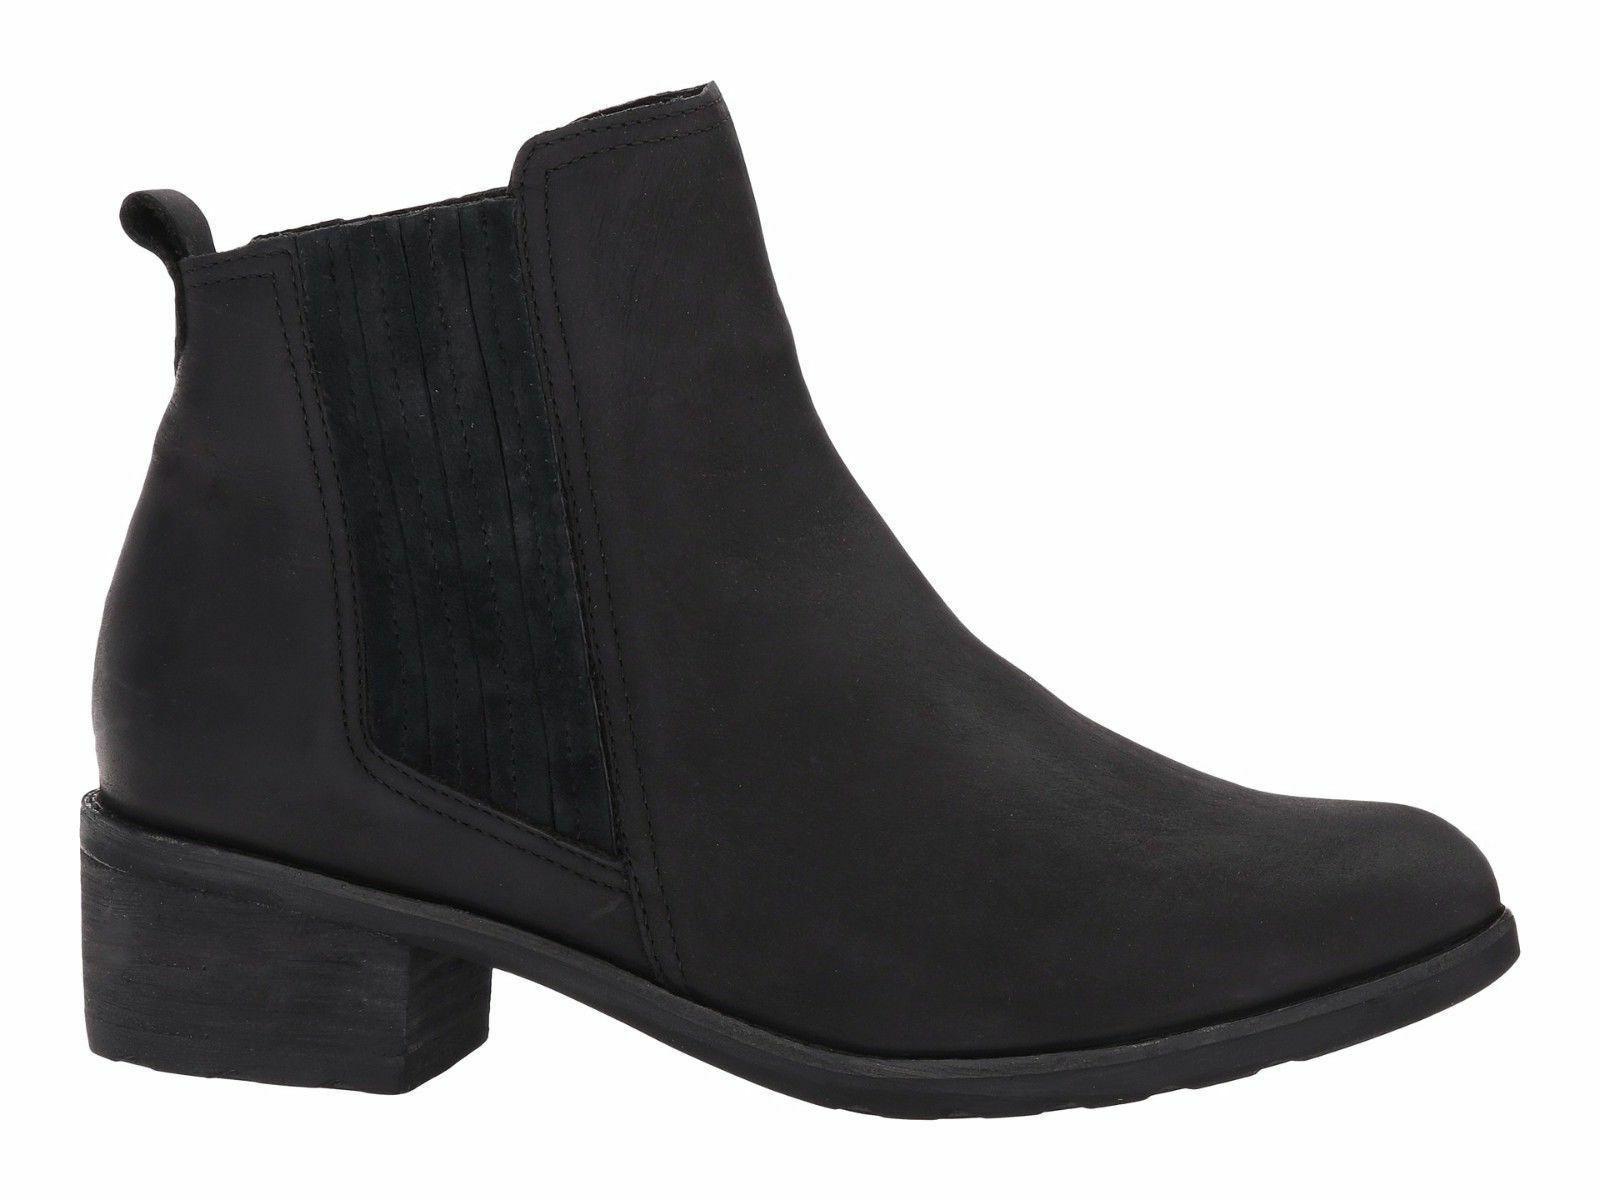 Reef Voyage Boot Black  Women's Suede Ankle Chelsea Bootie R